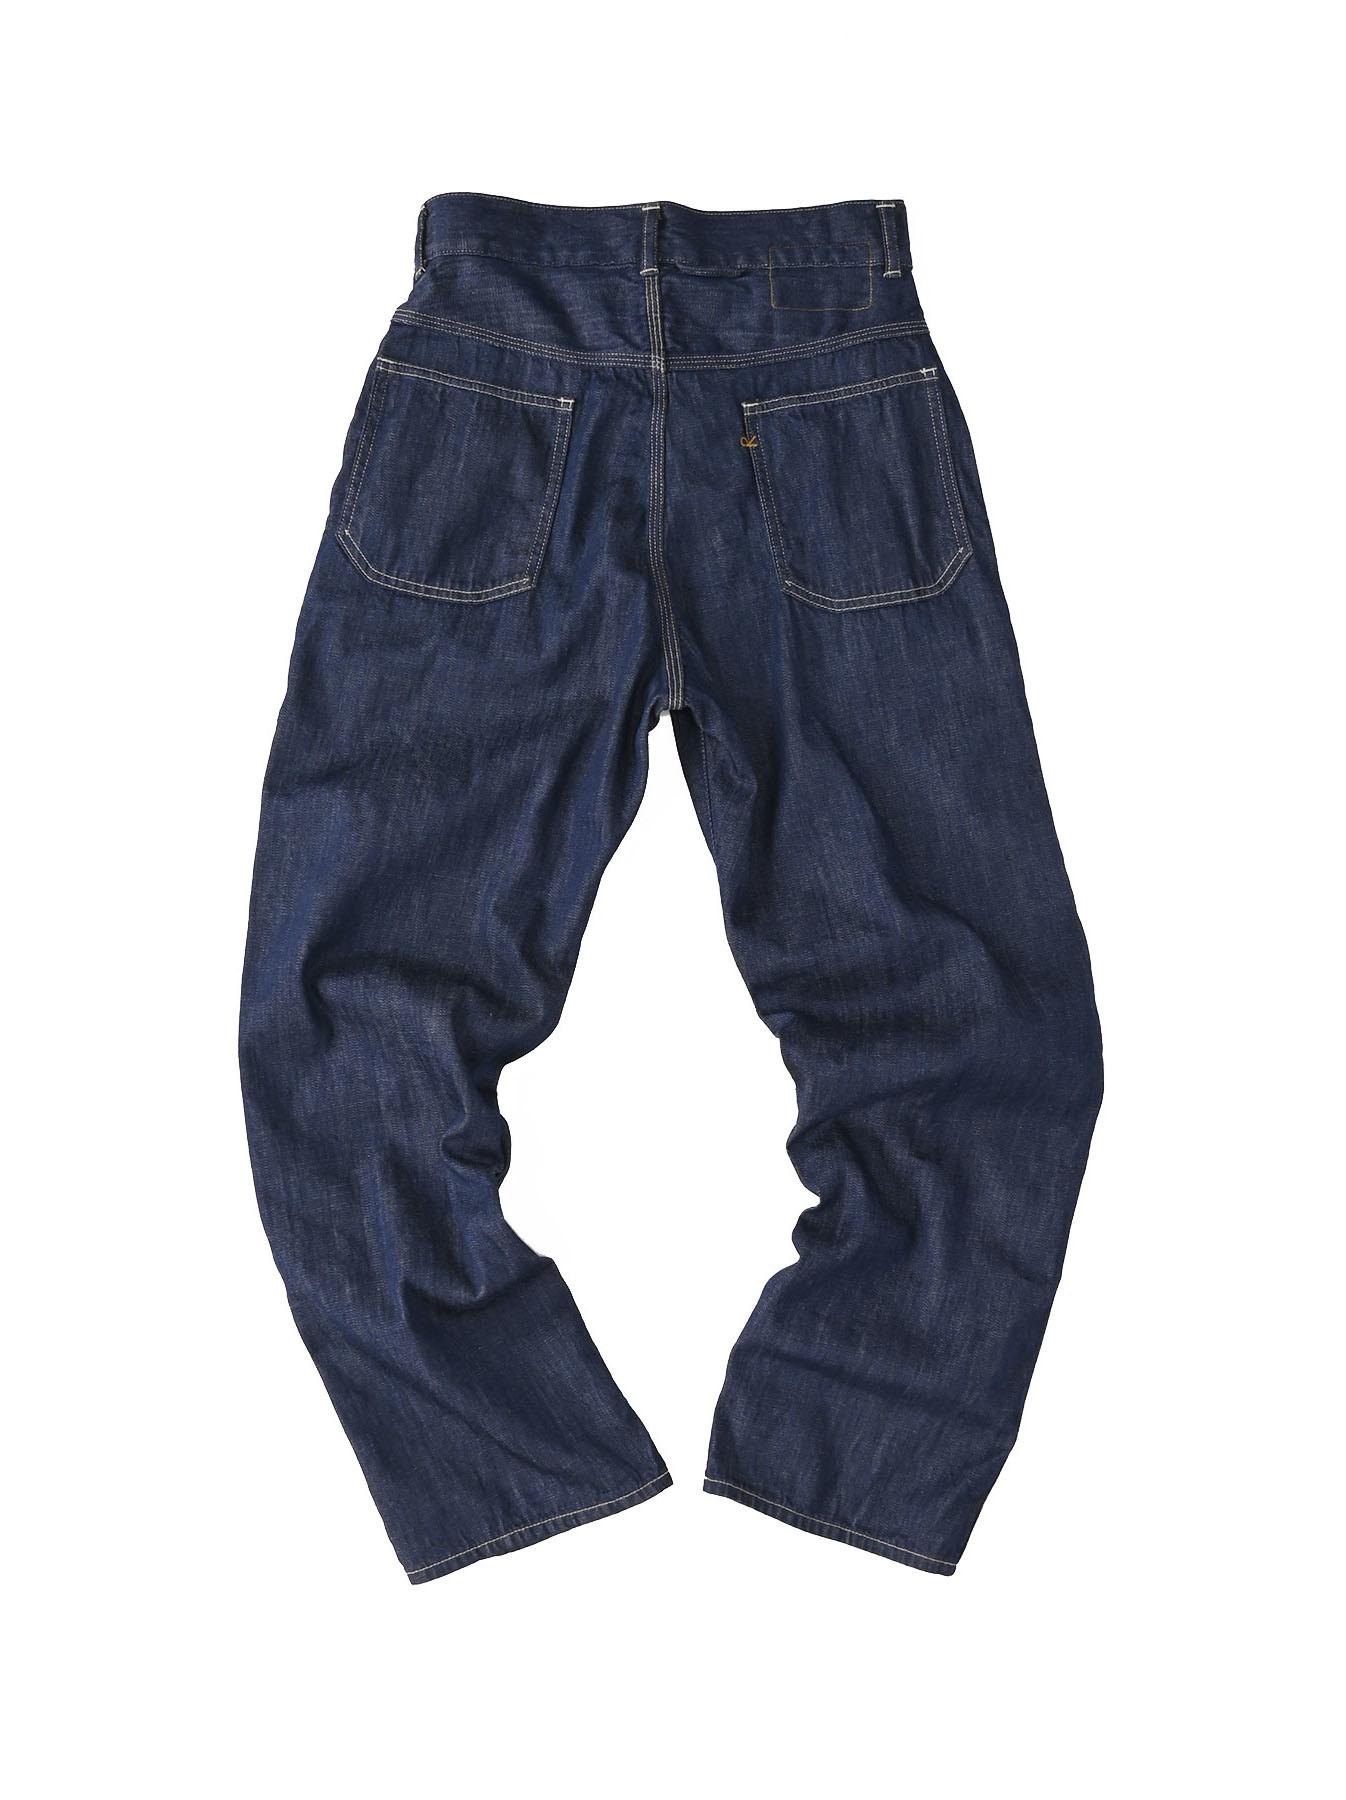 Indigo Nou 908 Painter Pants (0721)-6